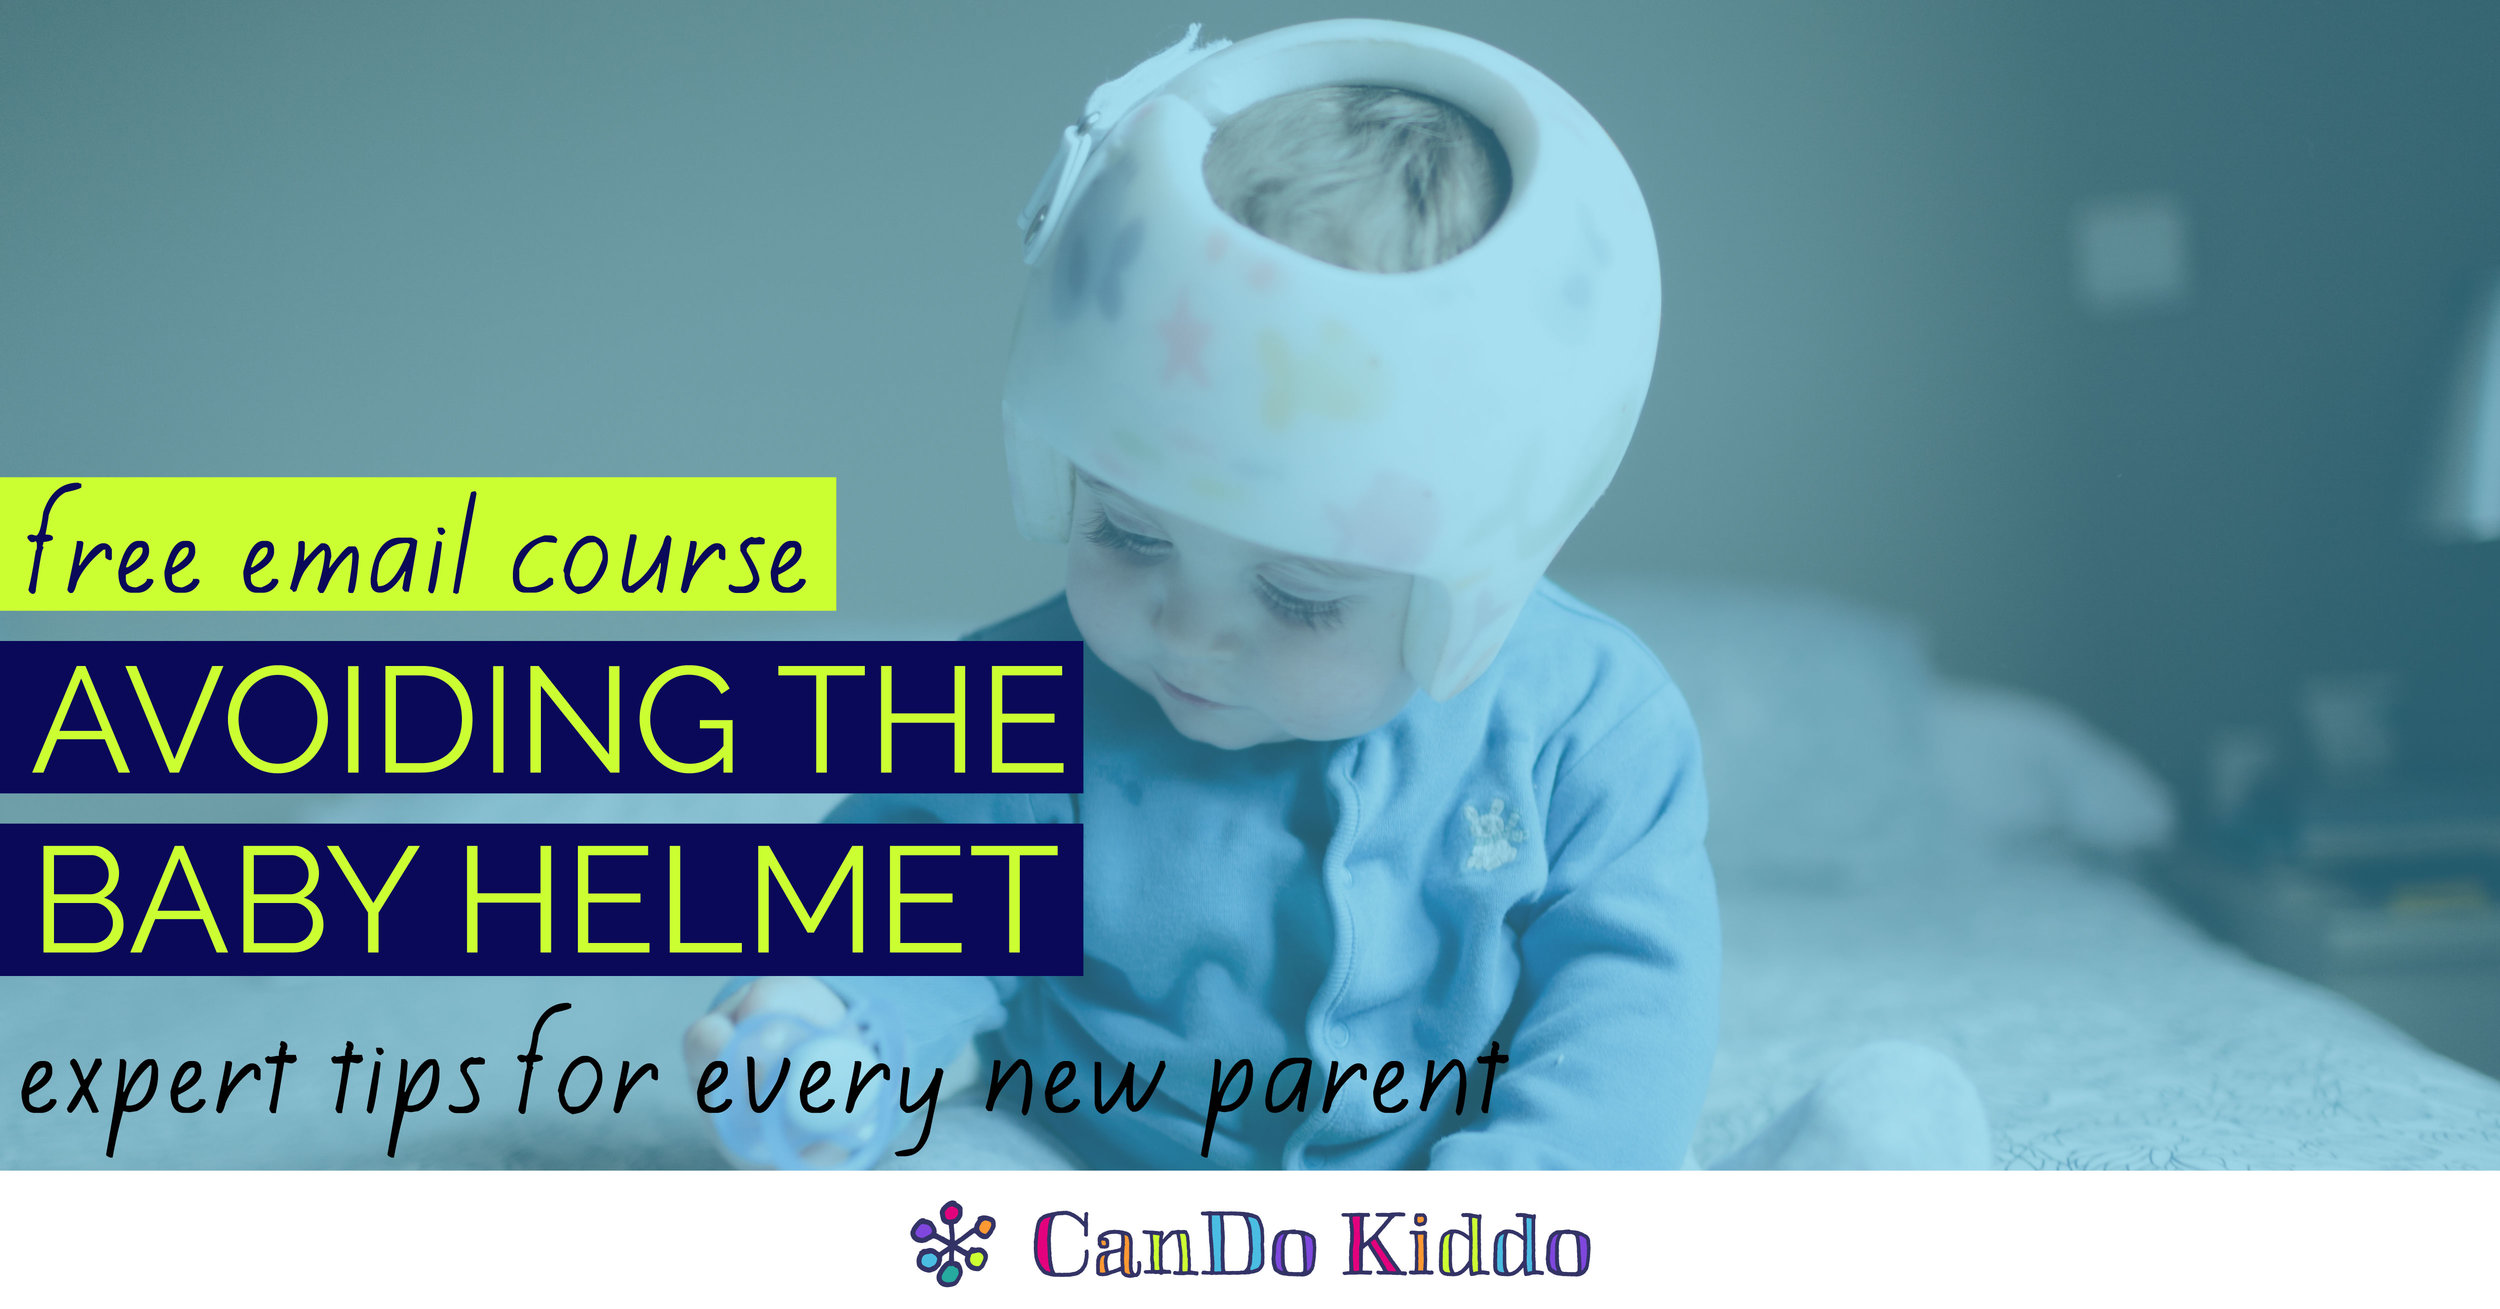 avoiding the baby helmet - CanDoKiddo.com